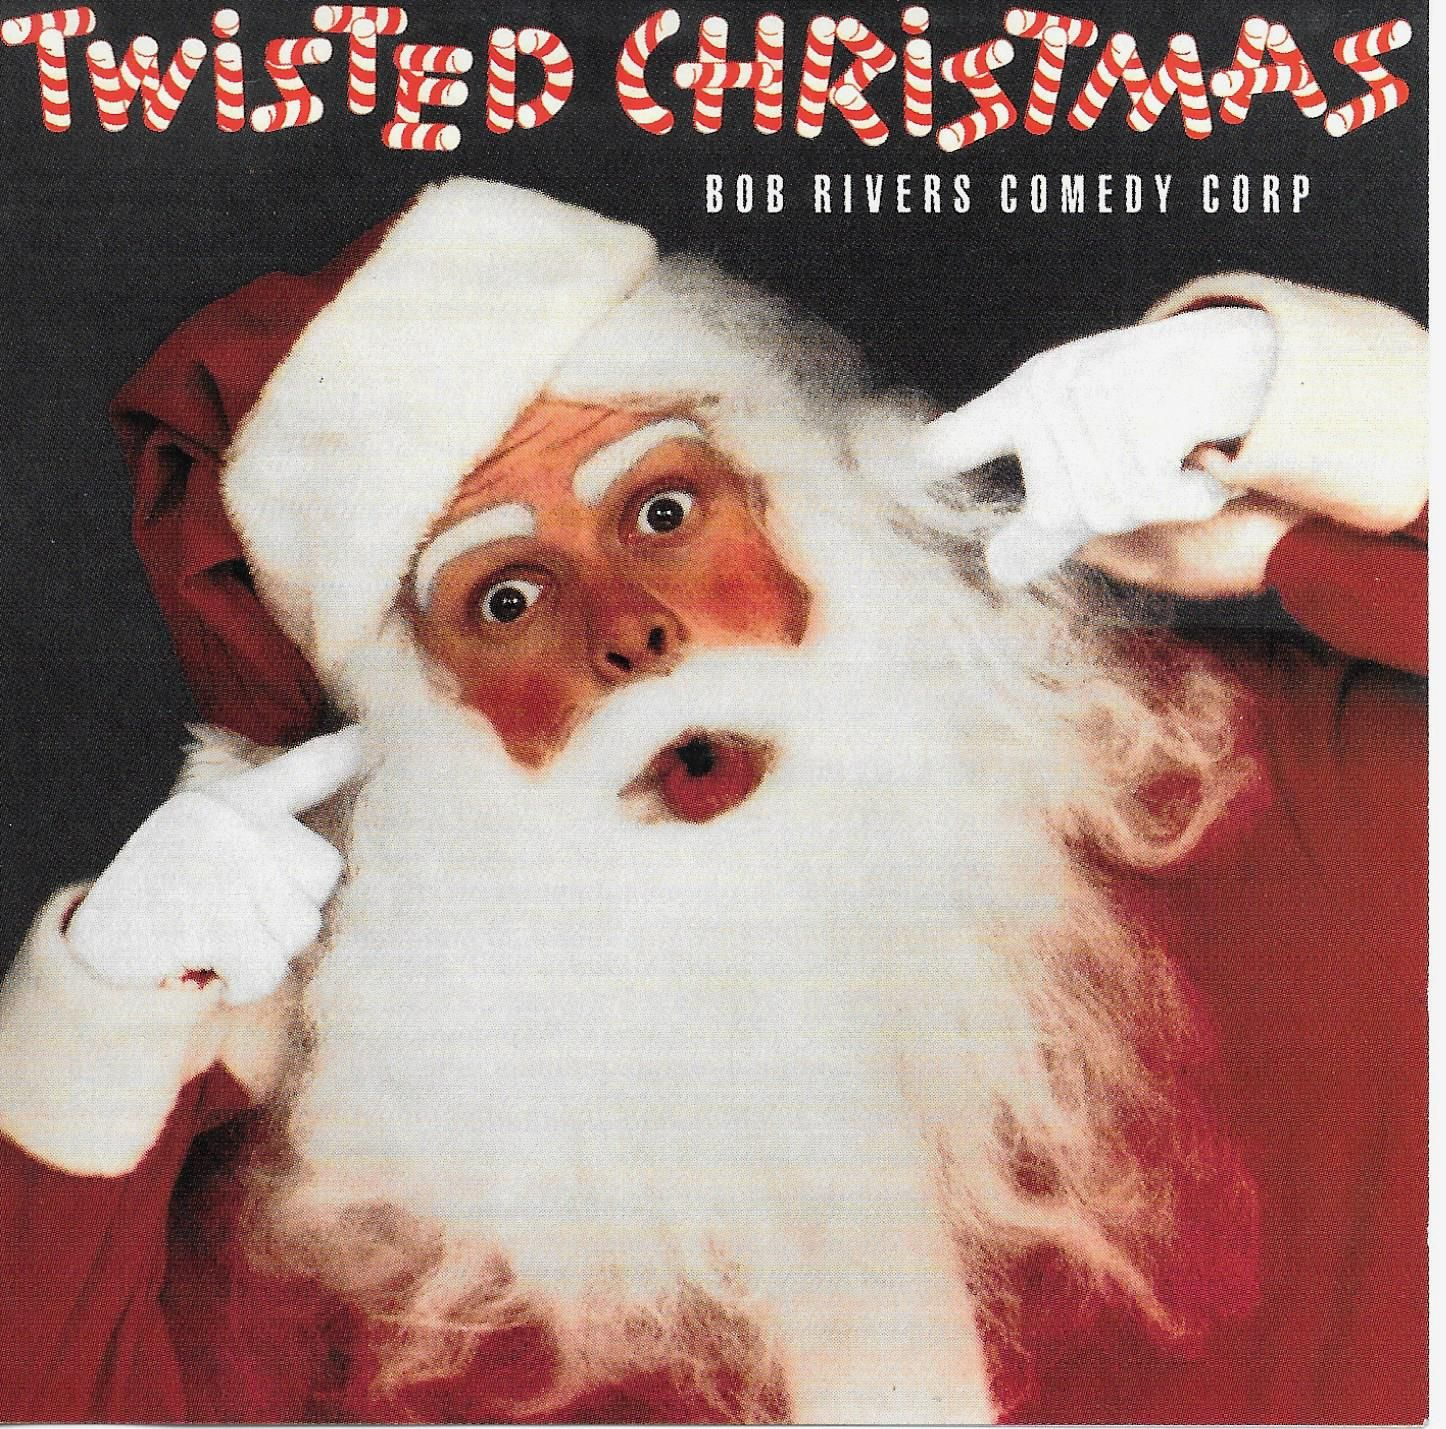 Twisted Christmas By Bob Bib Rivers Comedy Corp | Album Covers ...